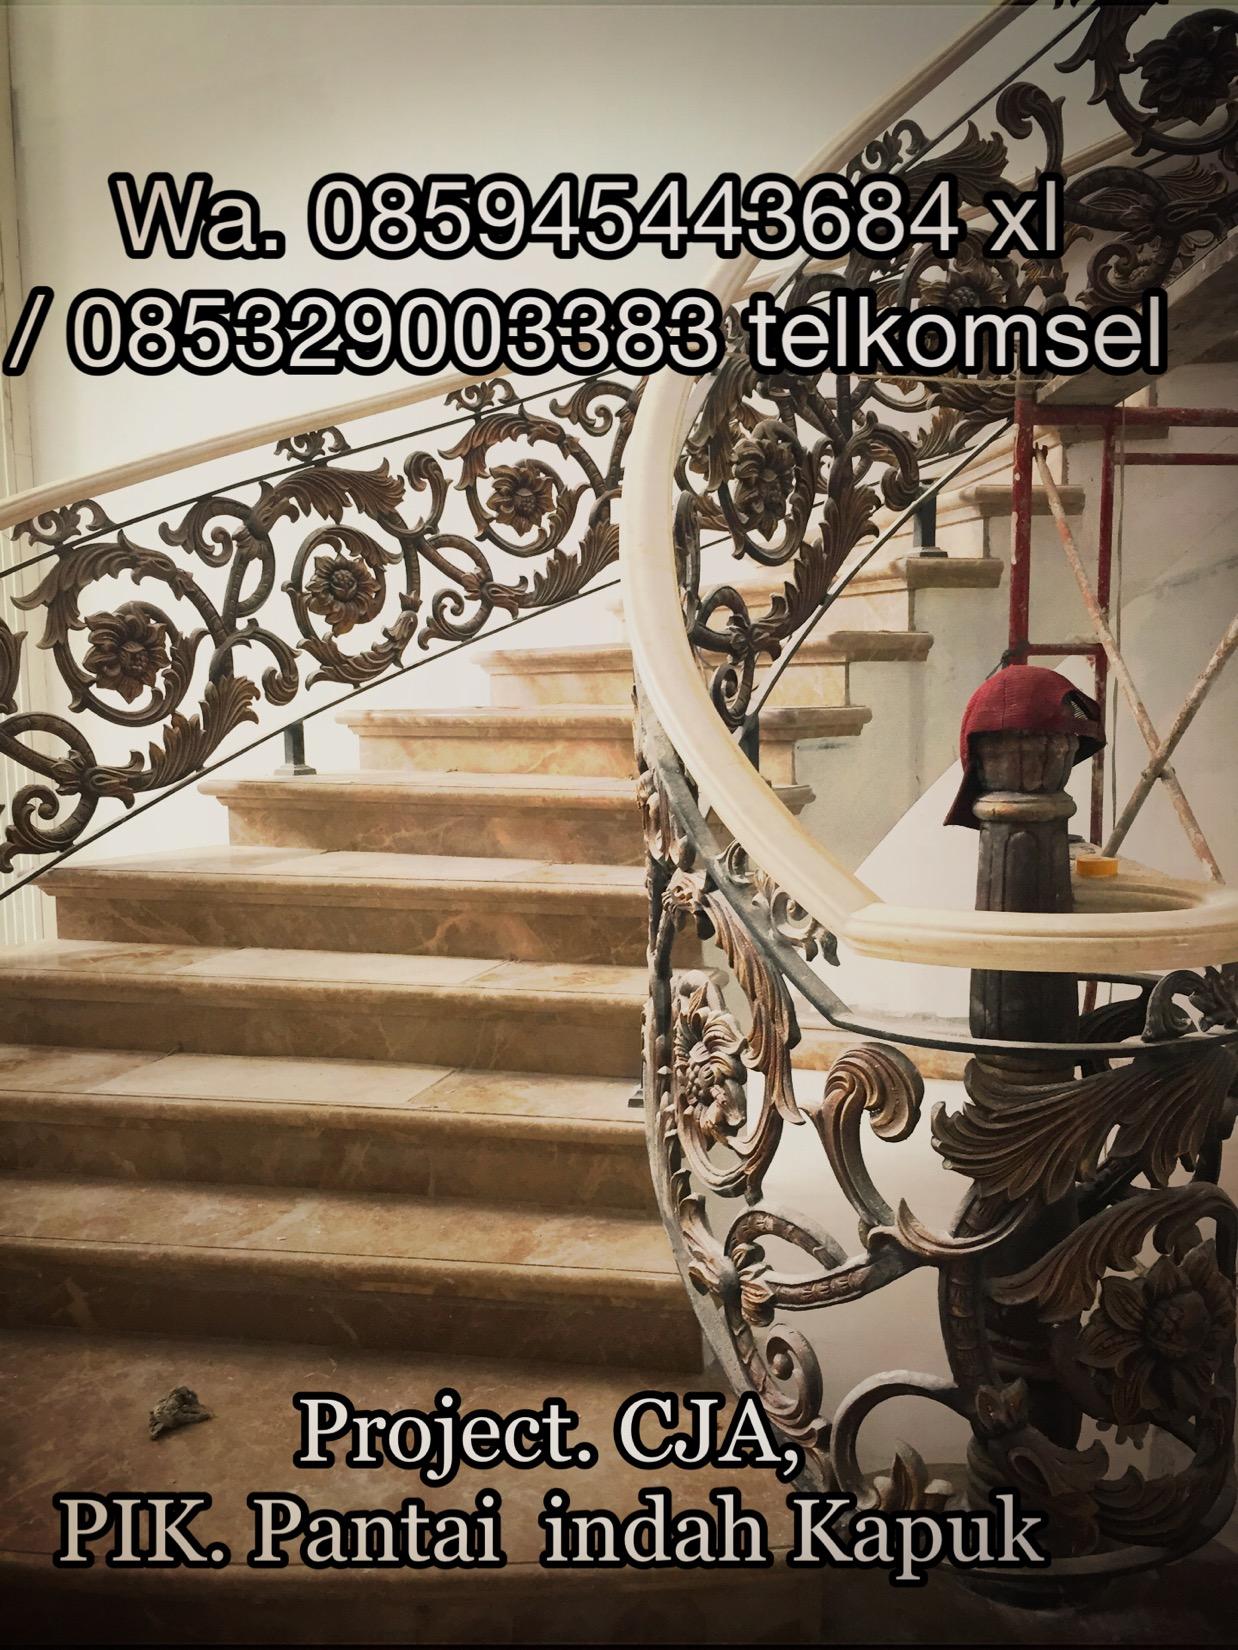 railing tangga klasik,railing tangga,tangga,balkon,railing tangga besi tempa klasik,railing balkon,railing tangga mewah,railing tangga kladik rumah mewah,ornamen railing tangga klasik,